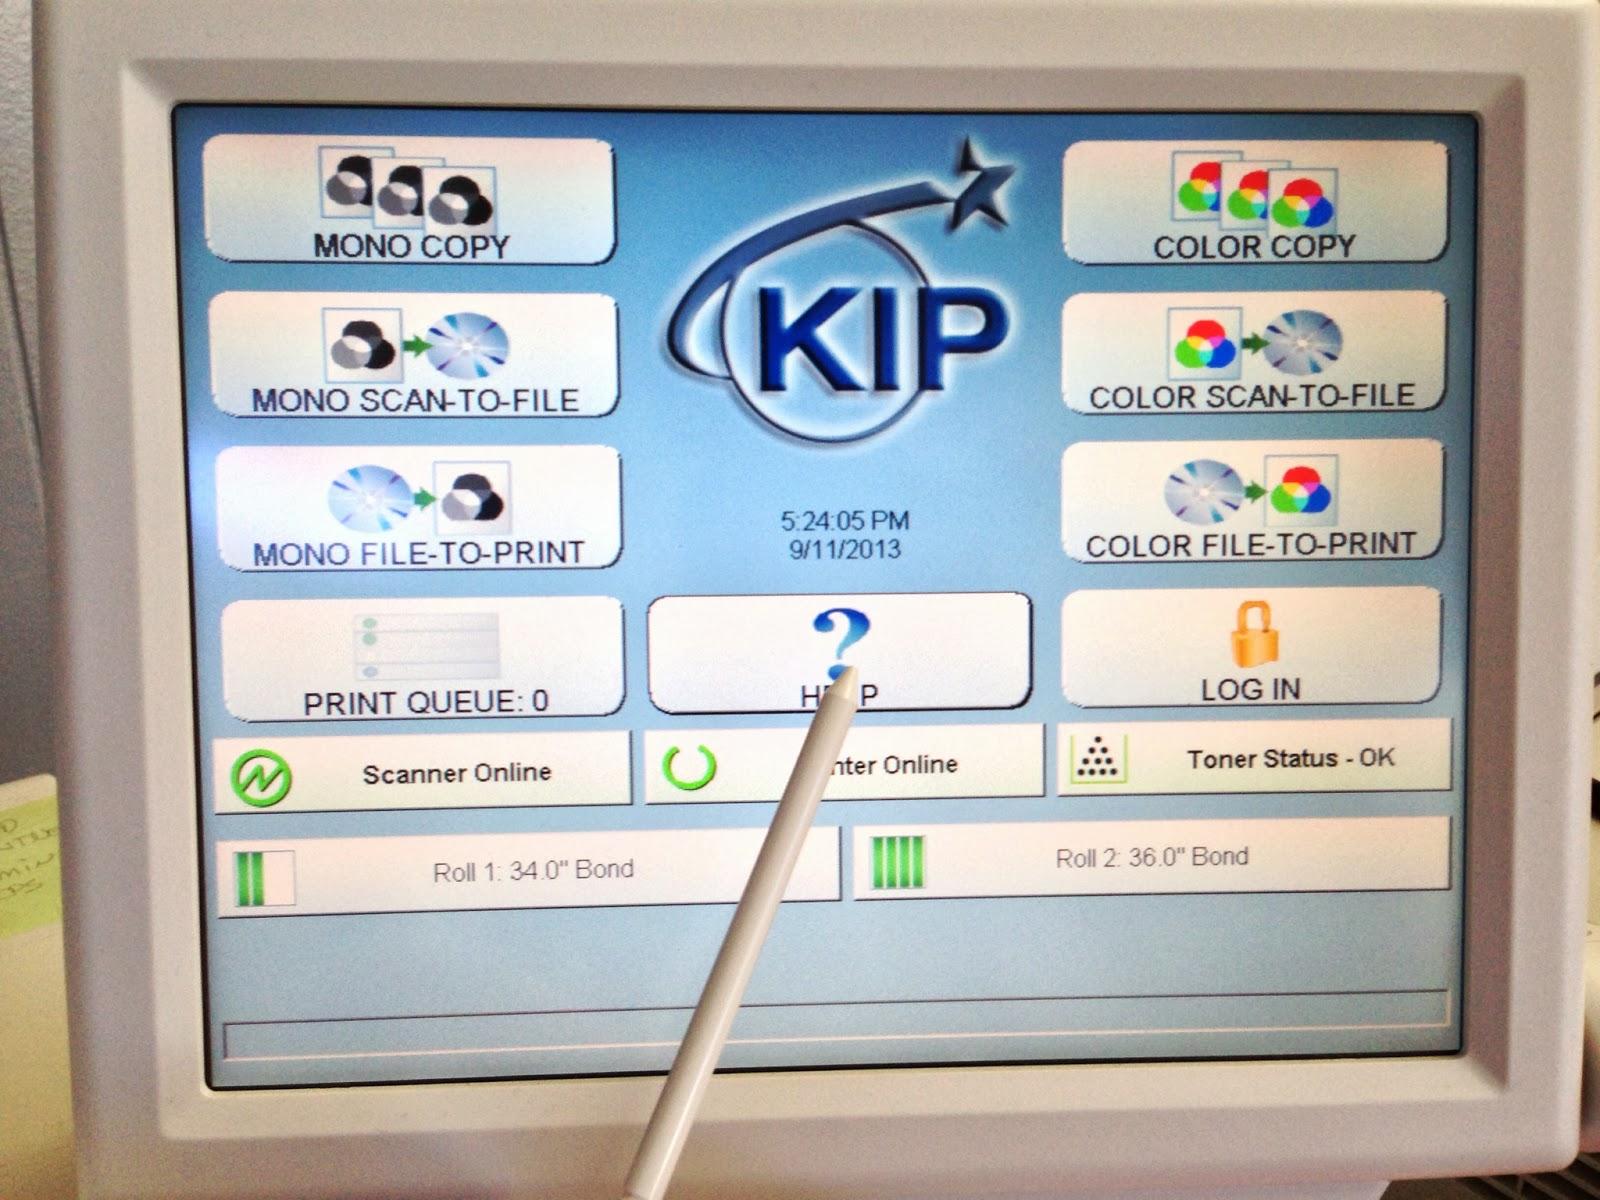 kip 7100 driver windows 8